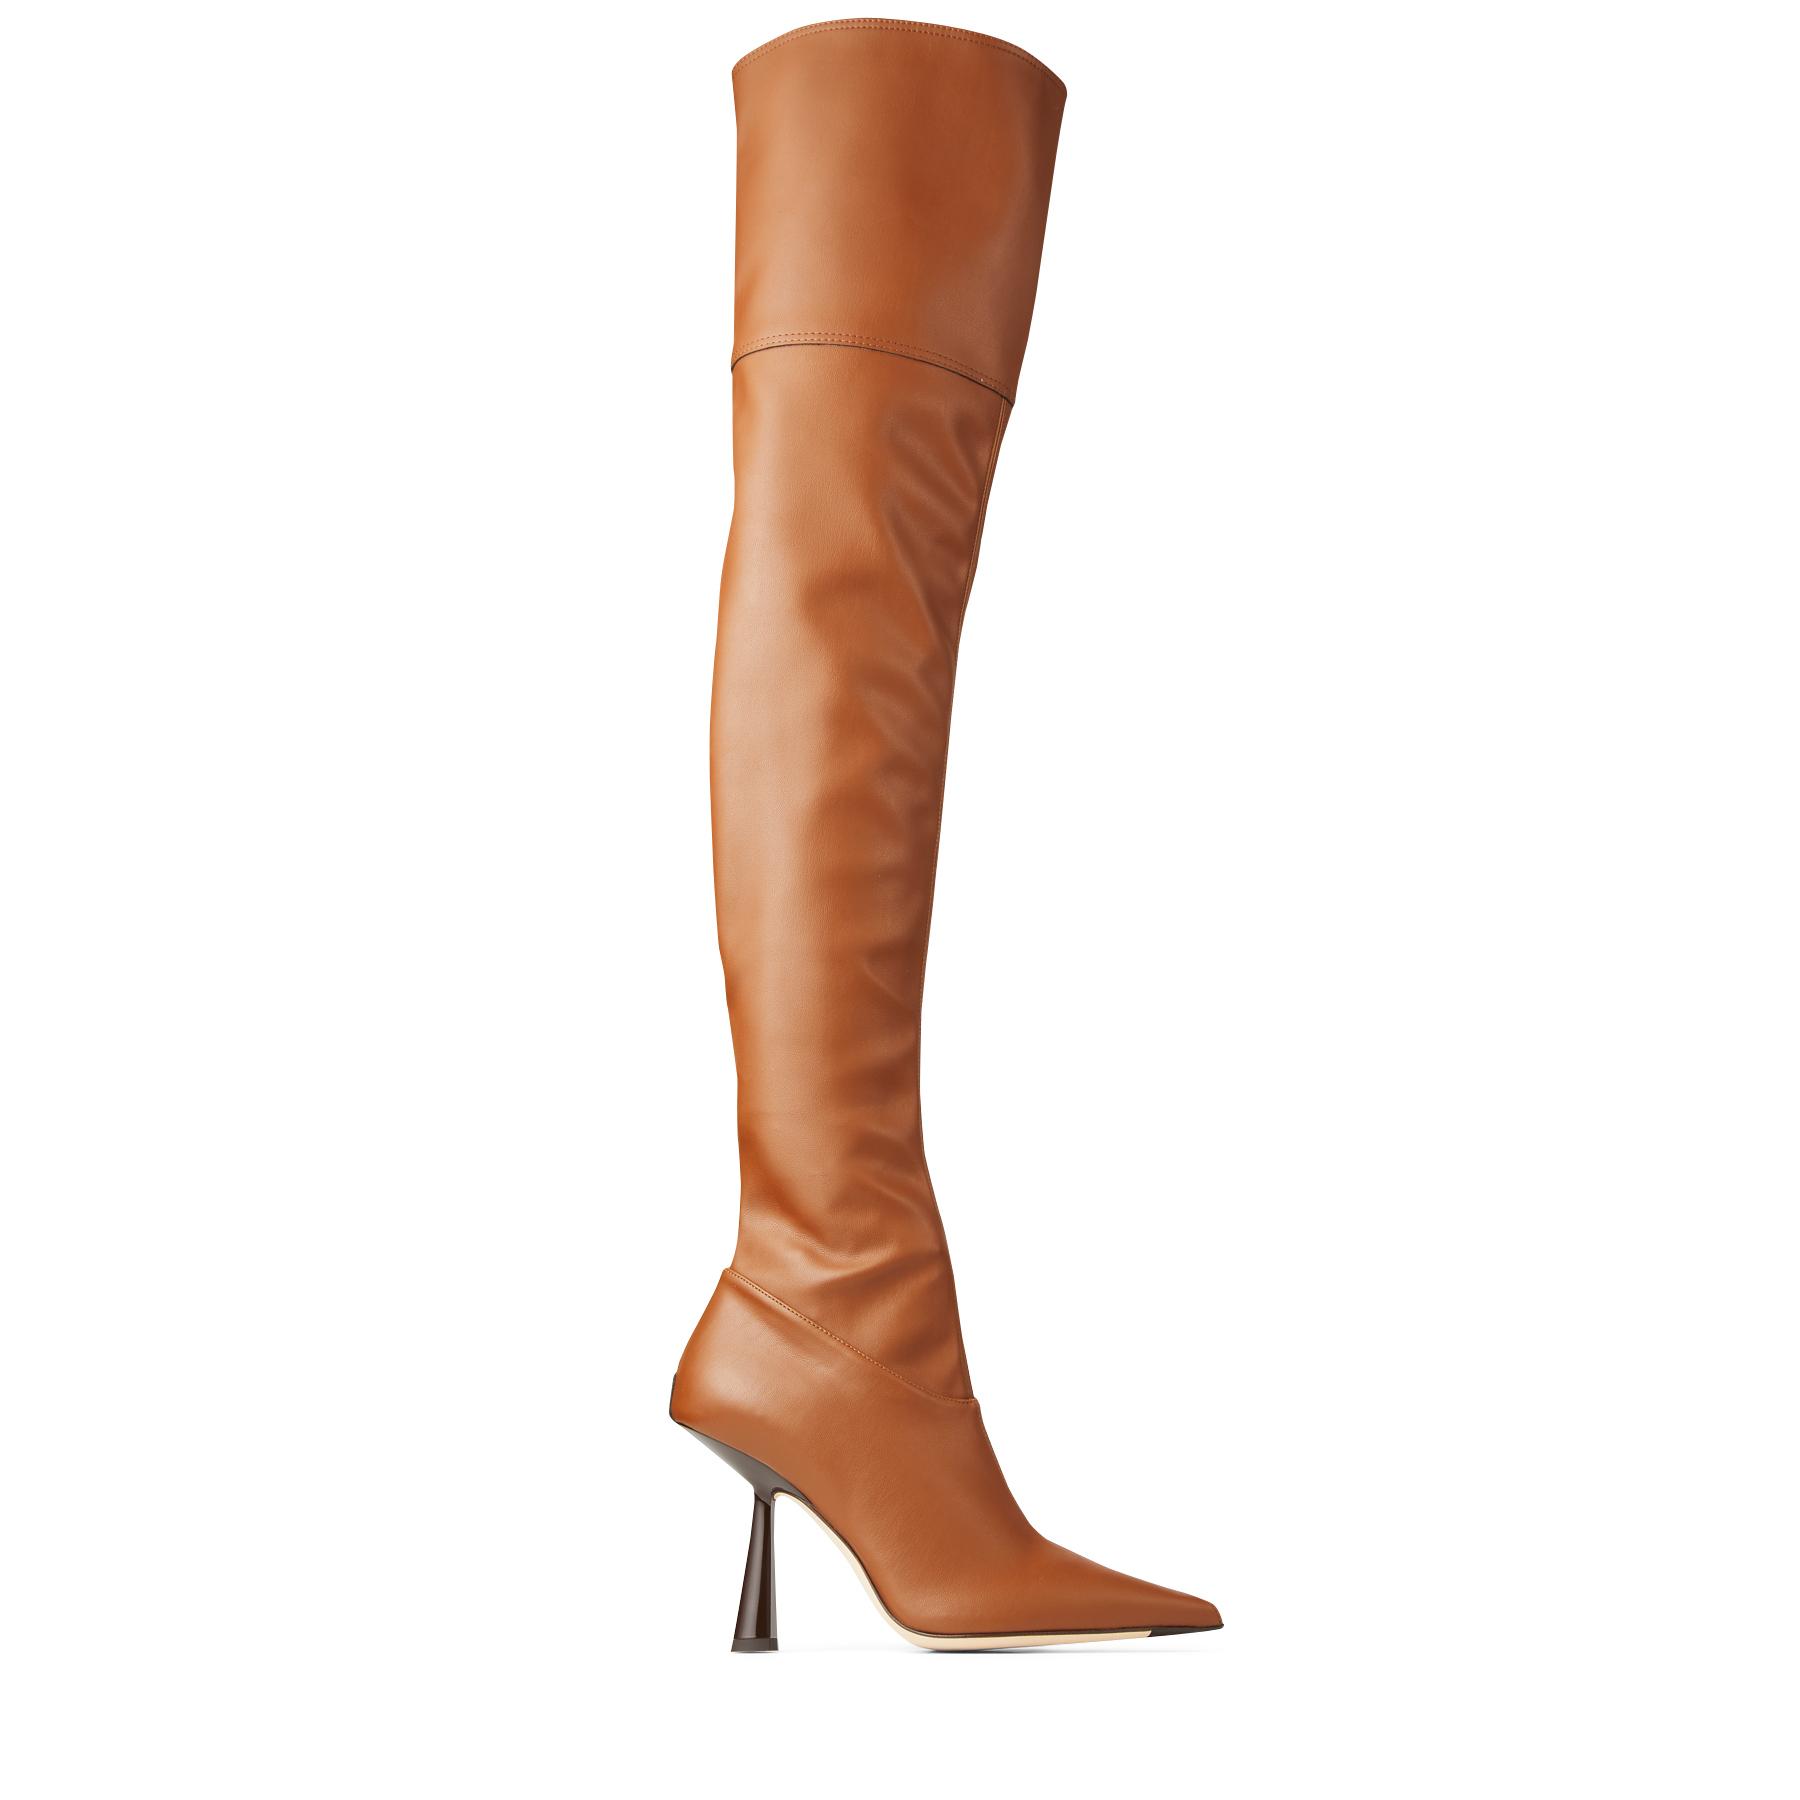 Bryson 100 boots